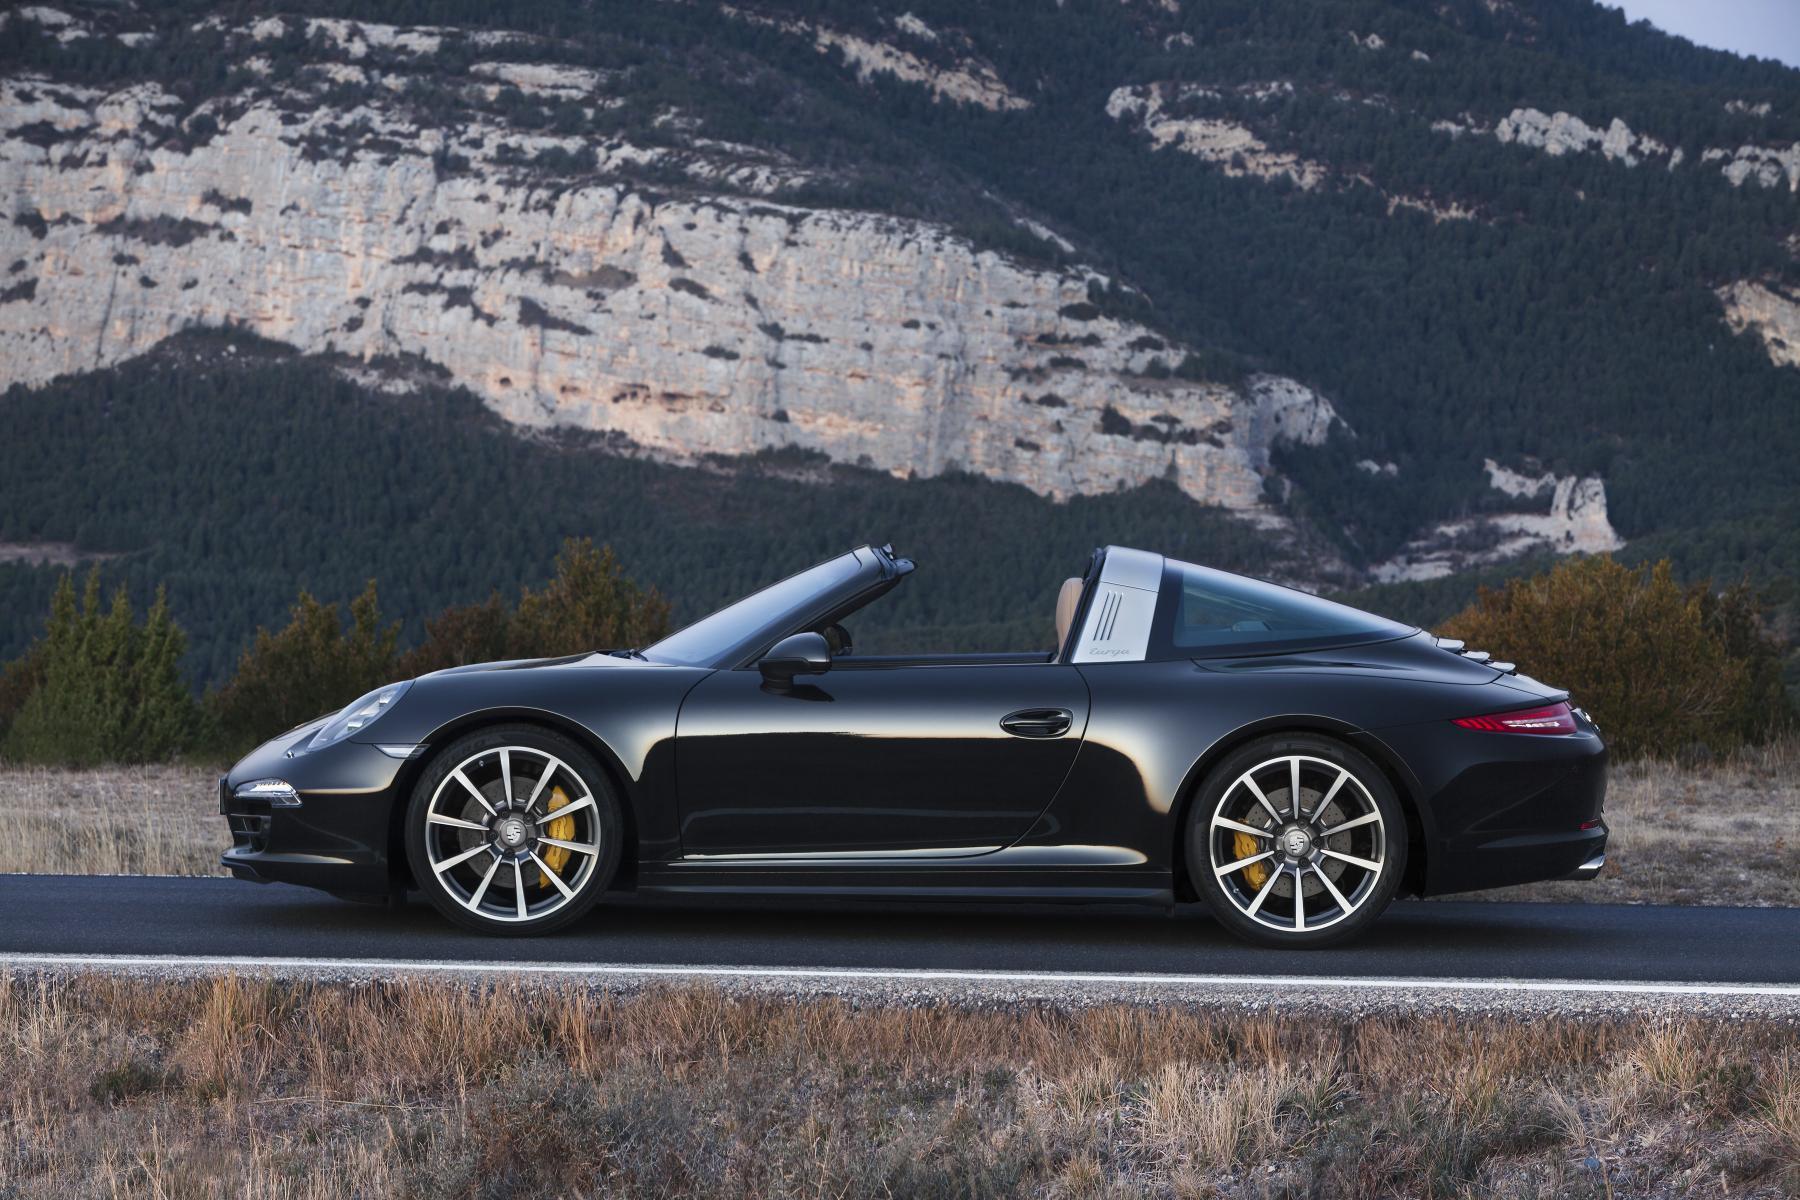 2014 991 porsche 911 targa revealed at detroit show performancedrive. Black Bedroom Furniture Sets. Home Design Ideas